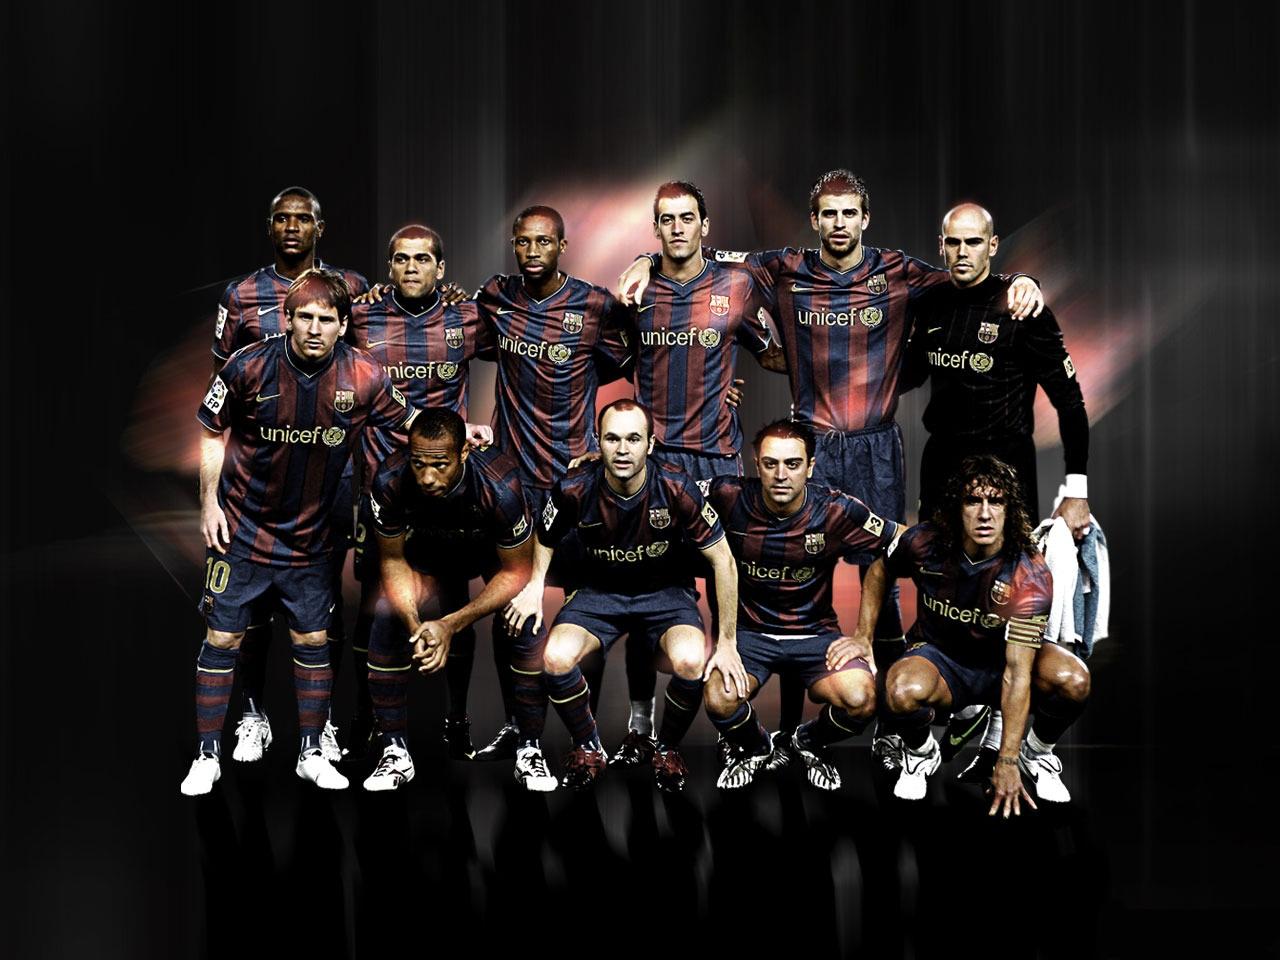 http://3.bp.blogspot.com/-Gj3vWEqMZxY/UPEk8lvhA6I/AAAAAAAAFj8/vZbjG3icpig/s1600/FC+Barcelona+Team+Cool+HD+Wallpapers+2013_.jpg